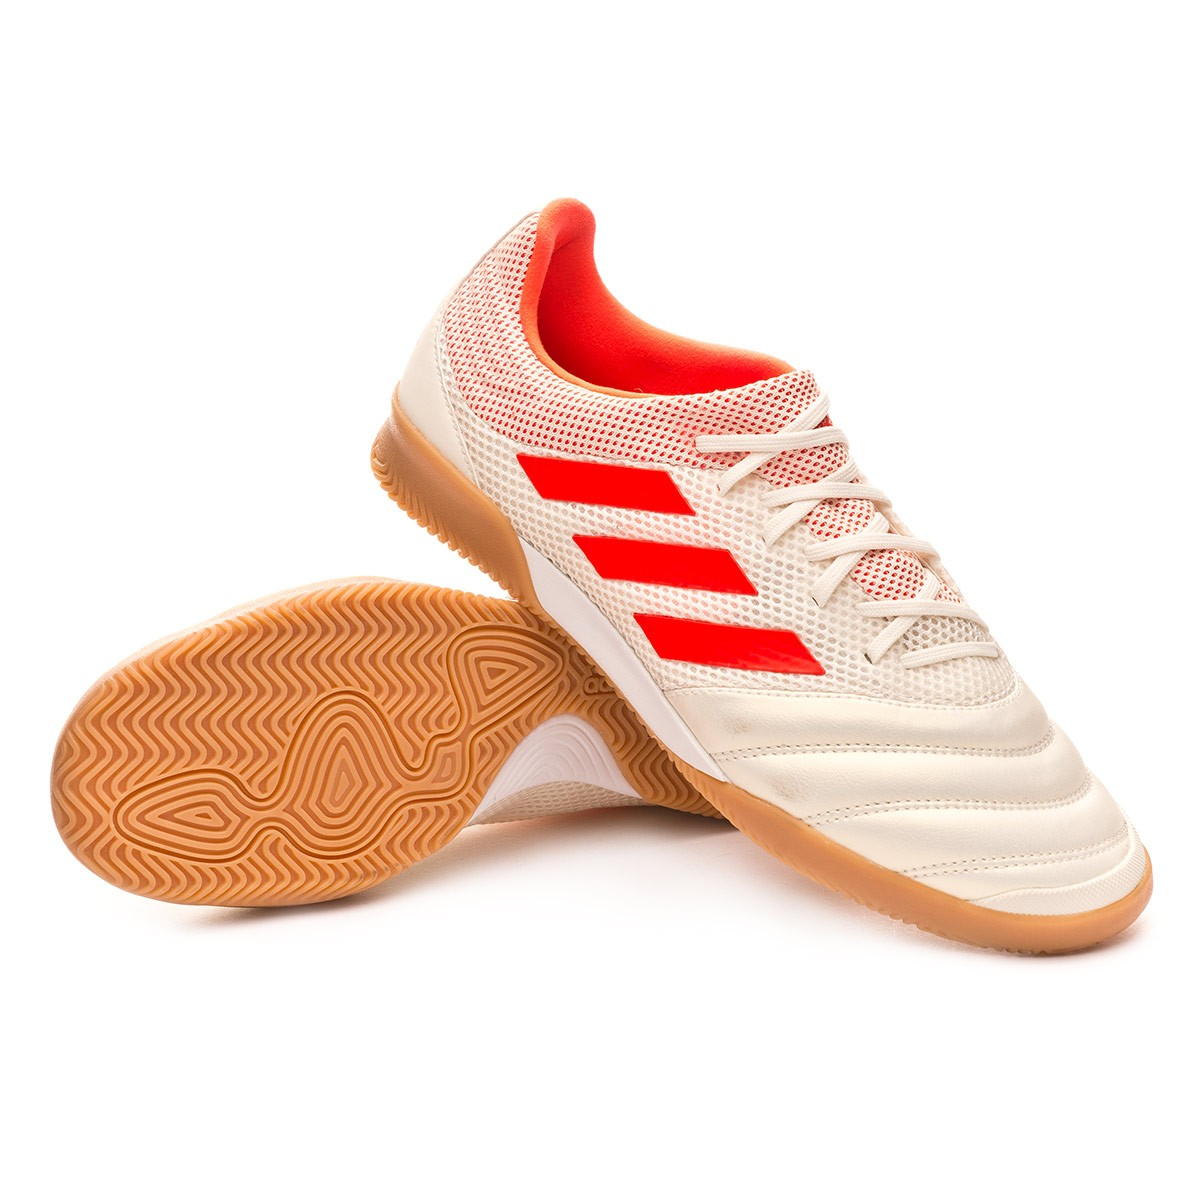 best service eb9af b5bb4 Tenis adidas Copa Tango 19.3 IN Sala Off white-Solar red-Gum - Soloporteros  es ahora Fútbol Emotion